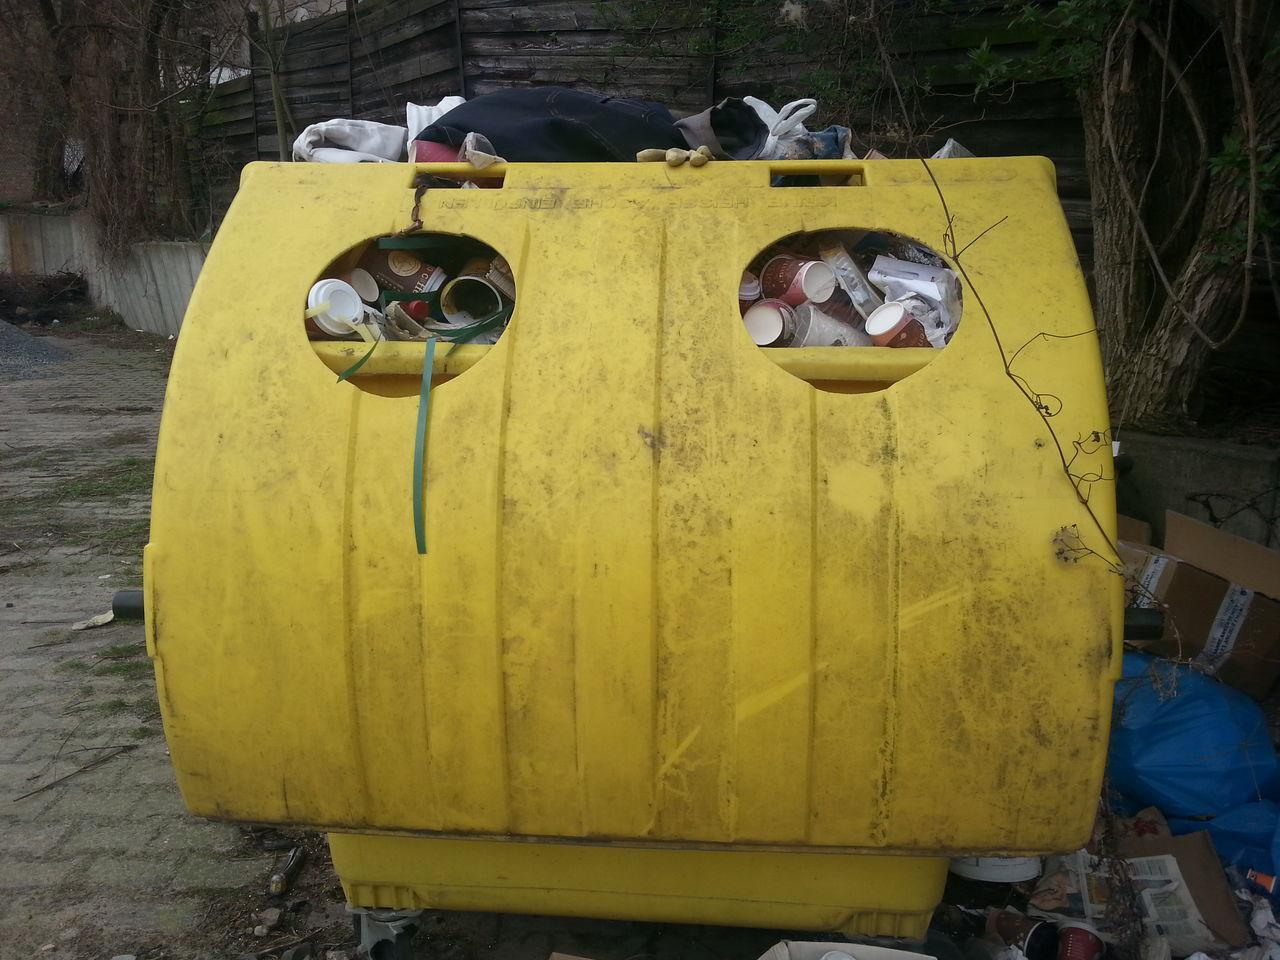 Yellow Dustbin Full Of Garbage